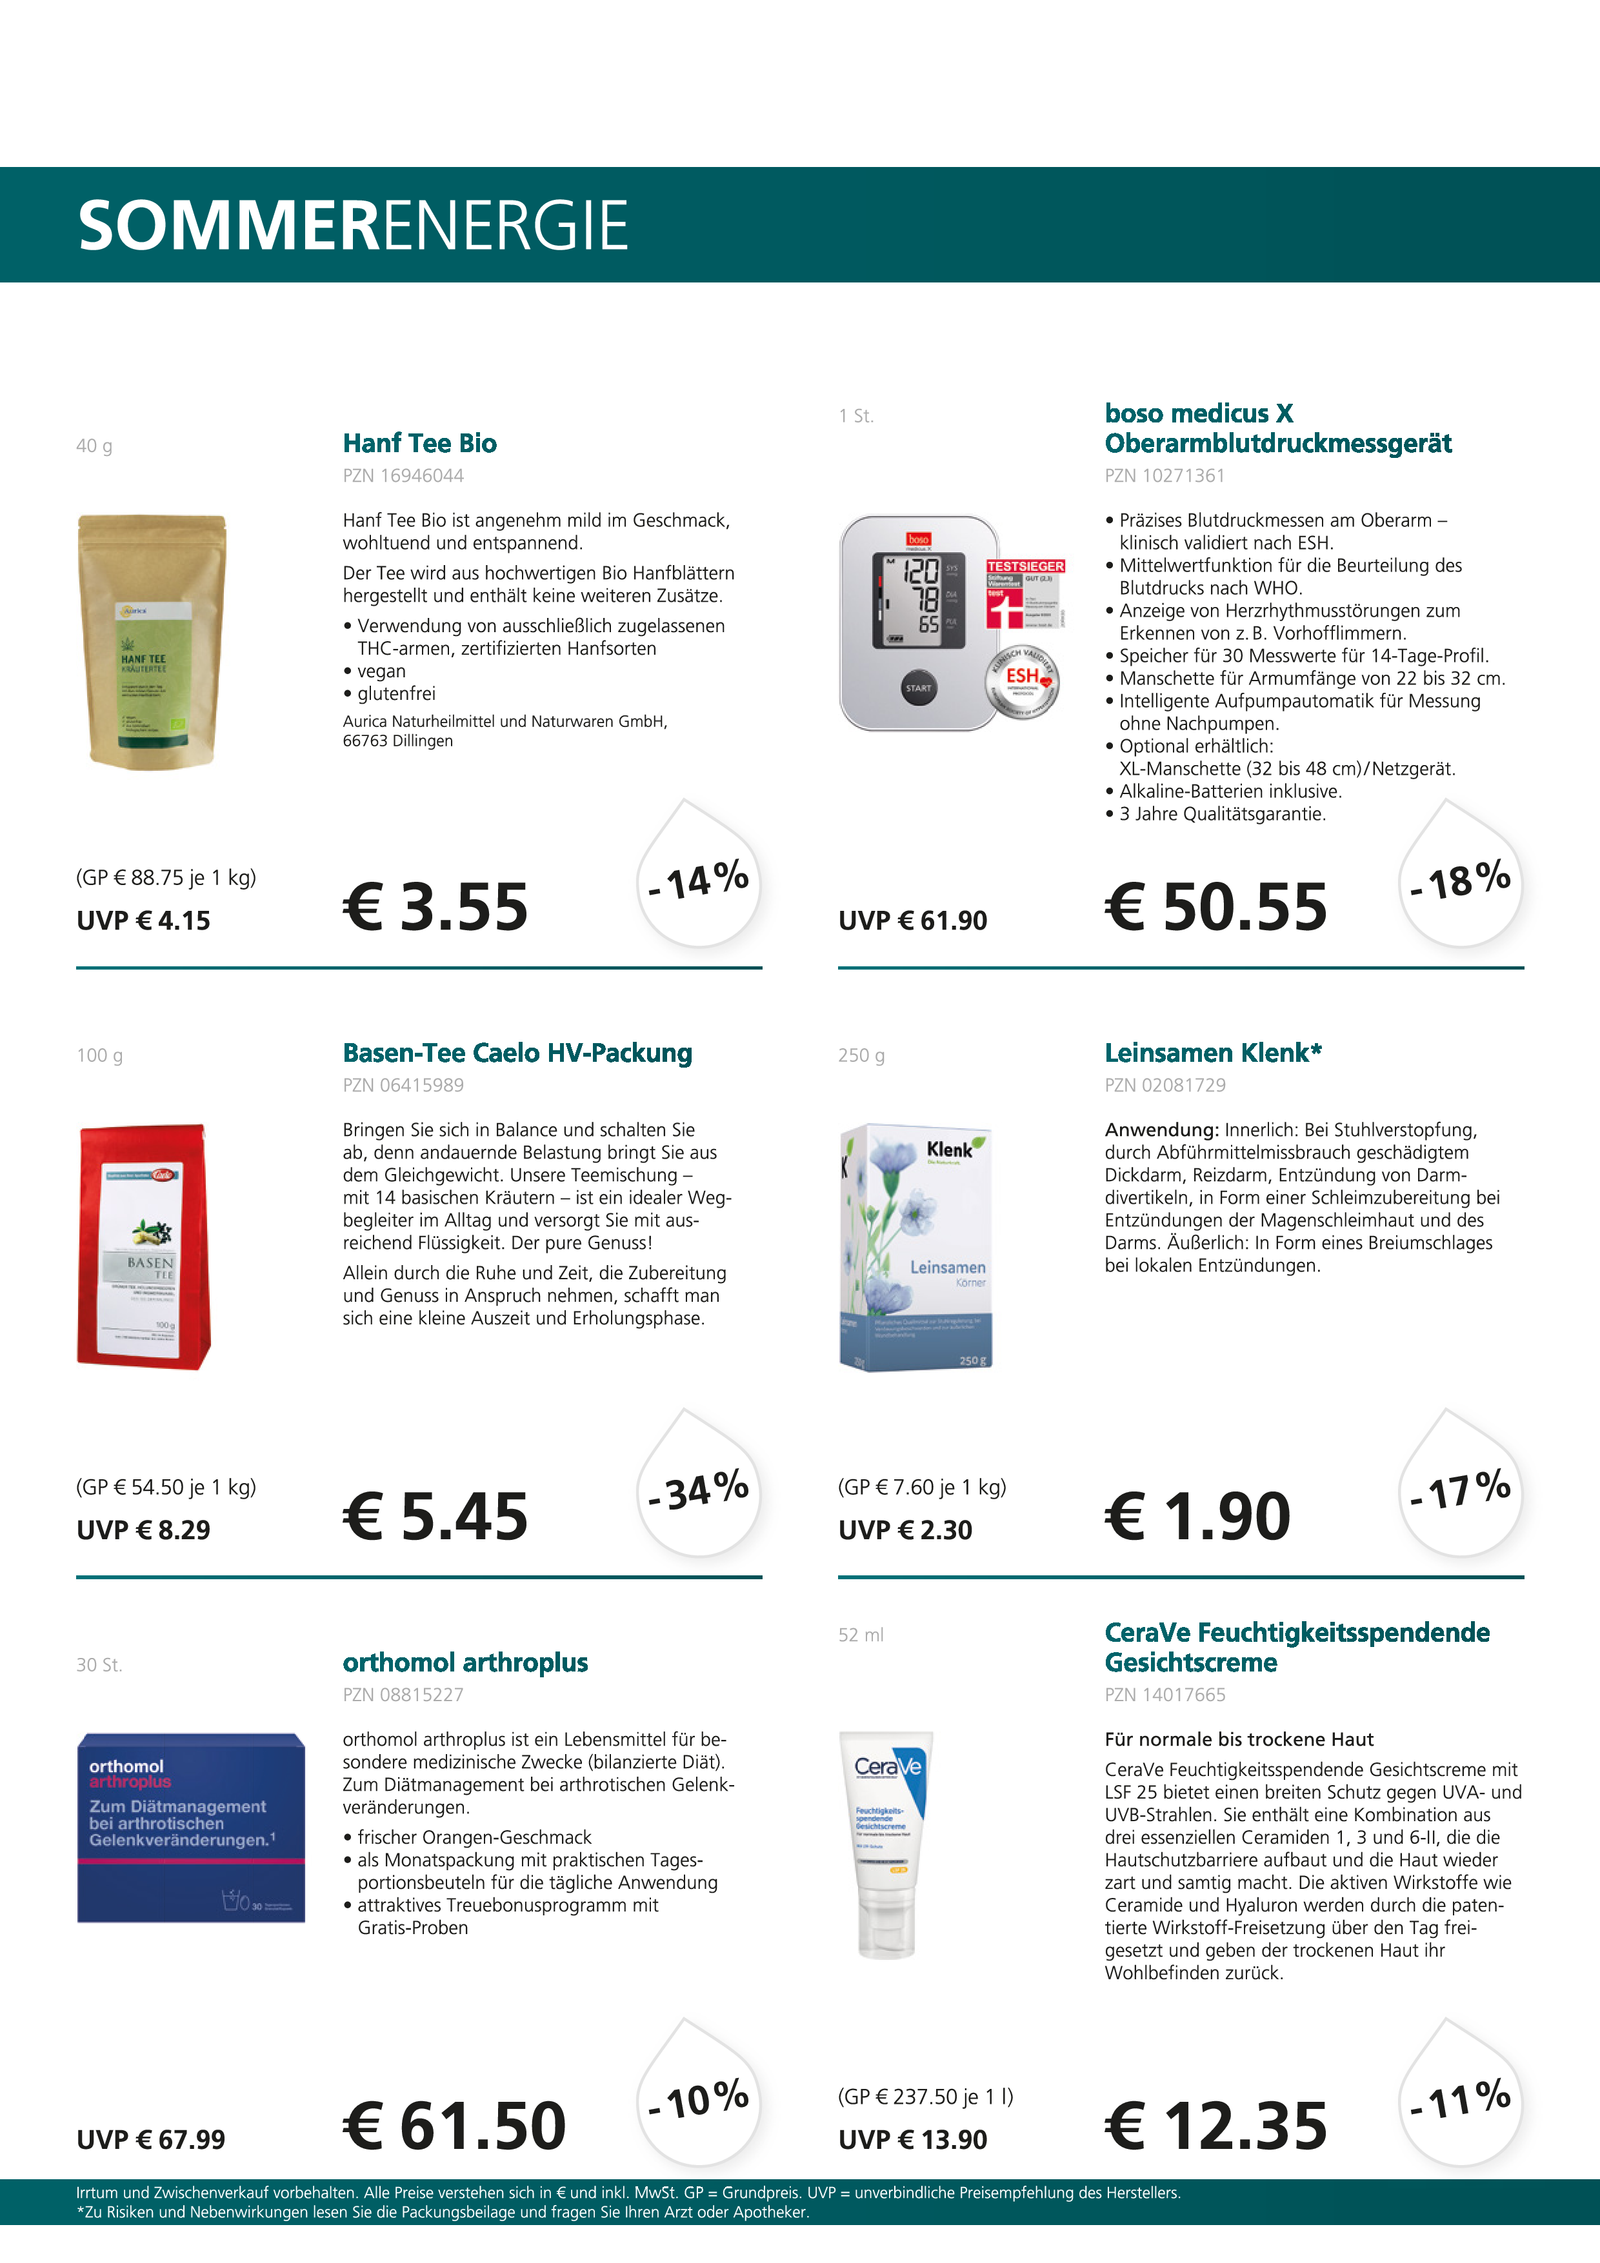 https://mein-uploads.apocdn.net/8089/leaflets/8089_flyer-Seite3.png